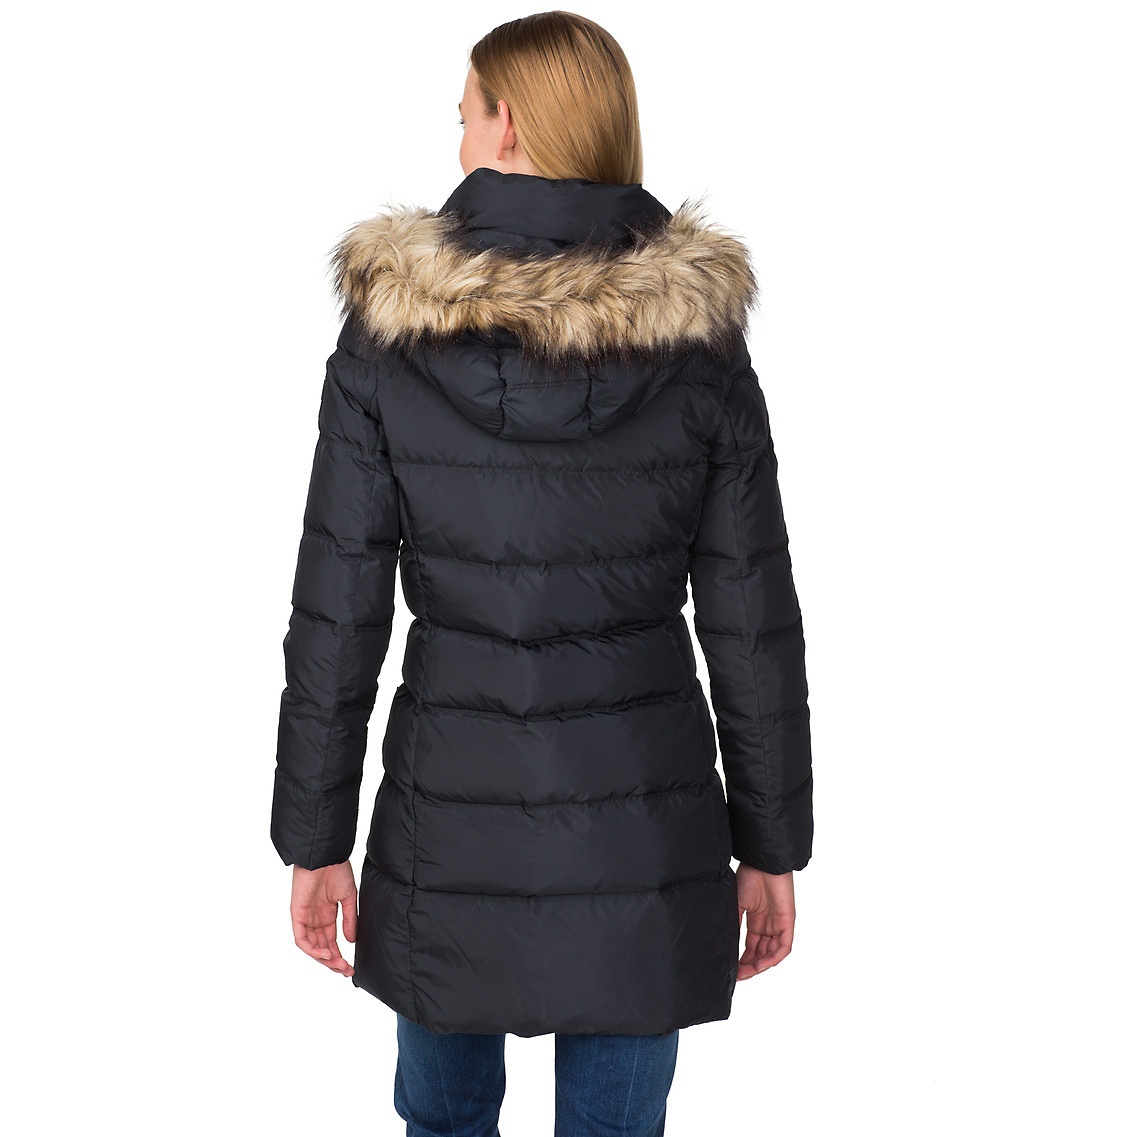 women 39 s the north face fuseform women 39 s faux fur jackets women 39 s. Black Bedroom Furniture Sets. Home Design Ideas